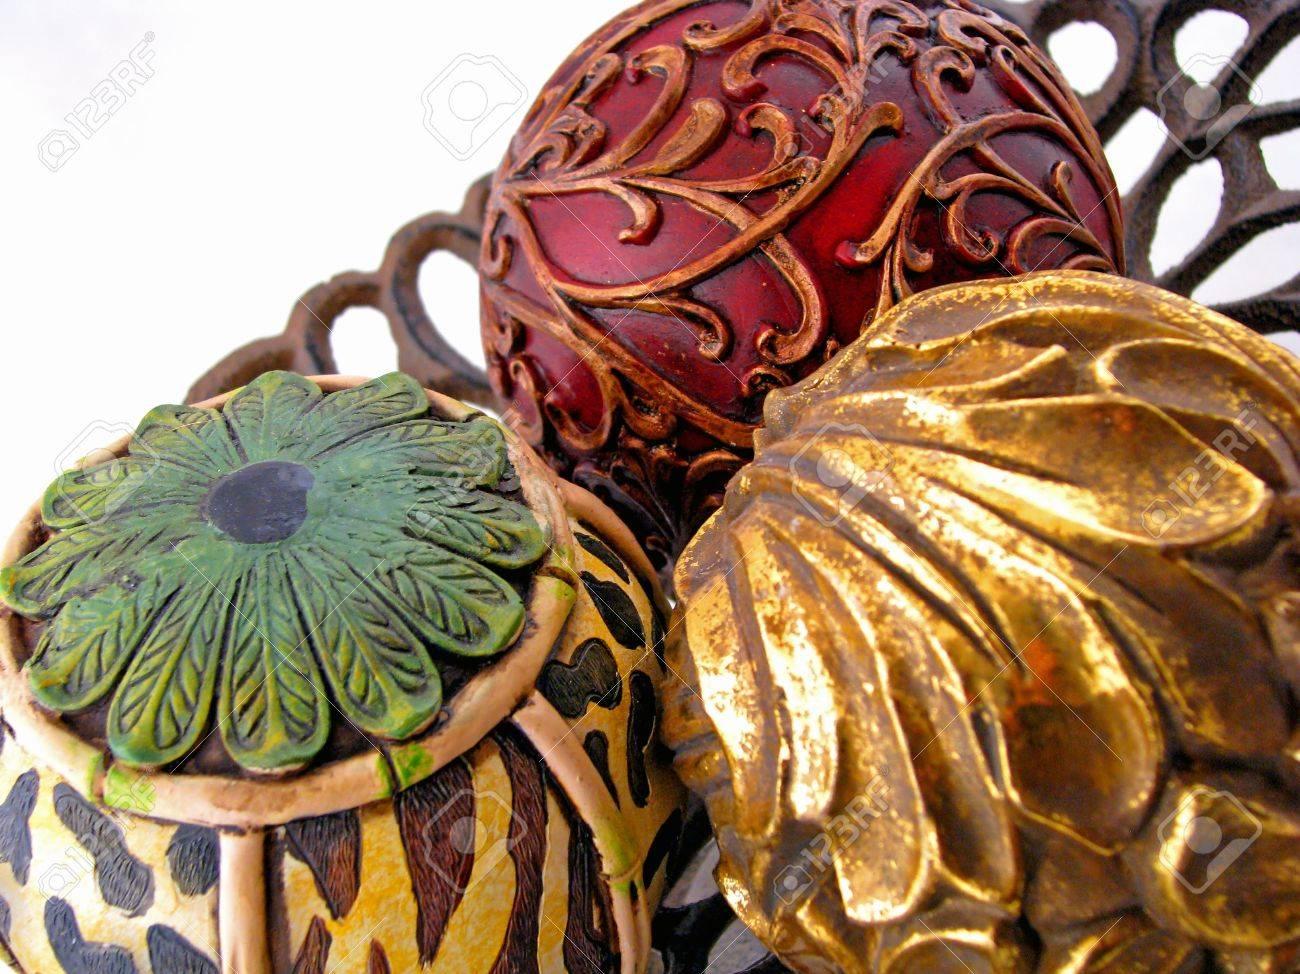 Three Colorful Decorative Balls Centerpiece Home Decor Stock Photo